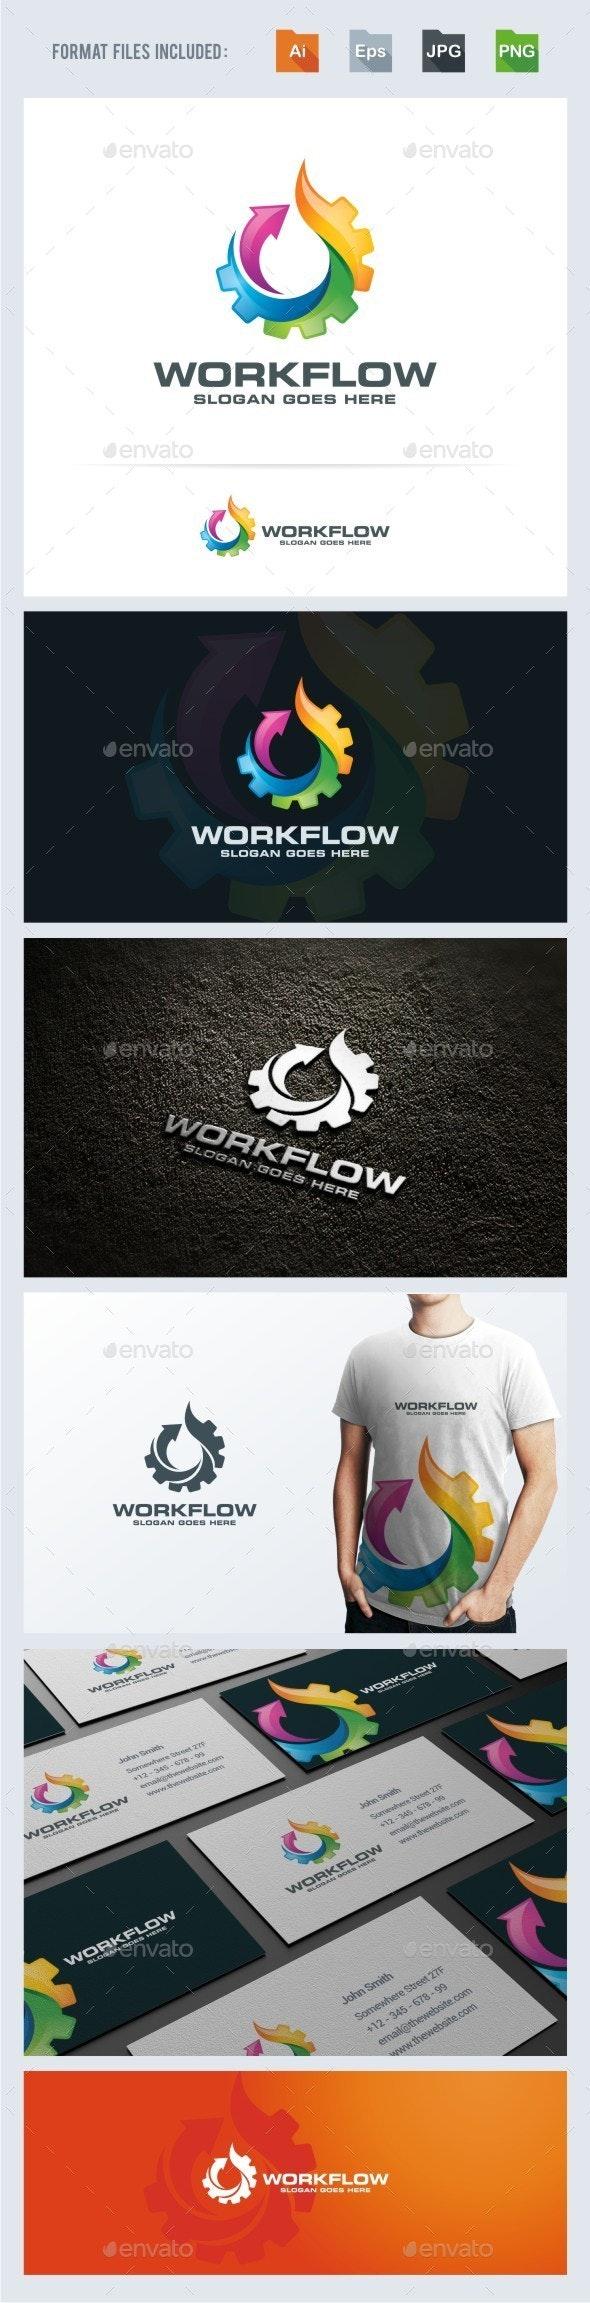 Work Flow - Gear Flame Logo Template - 3d Abstract